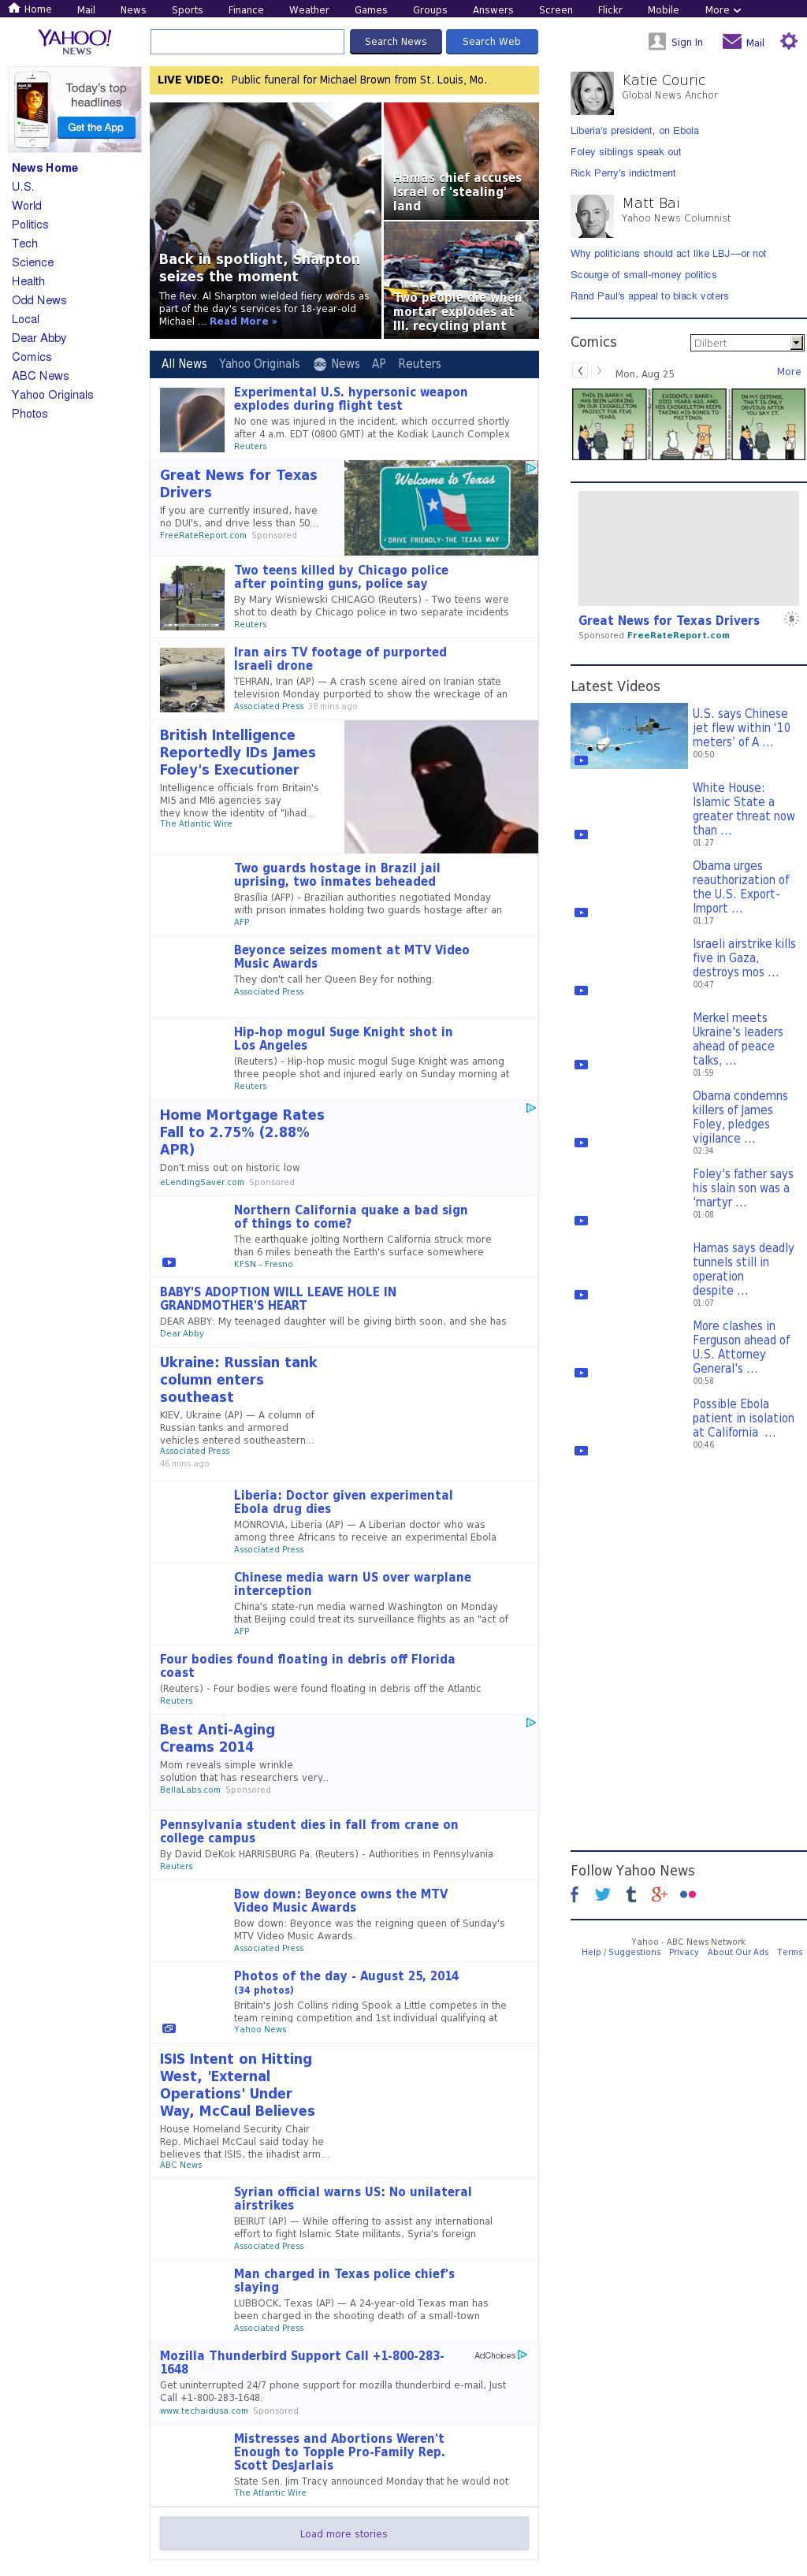 Yahoo! News at Monday Aug. 25, 2014, 5:25 p.m. UTC